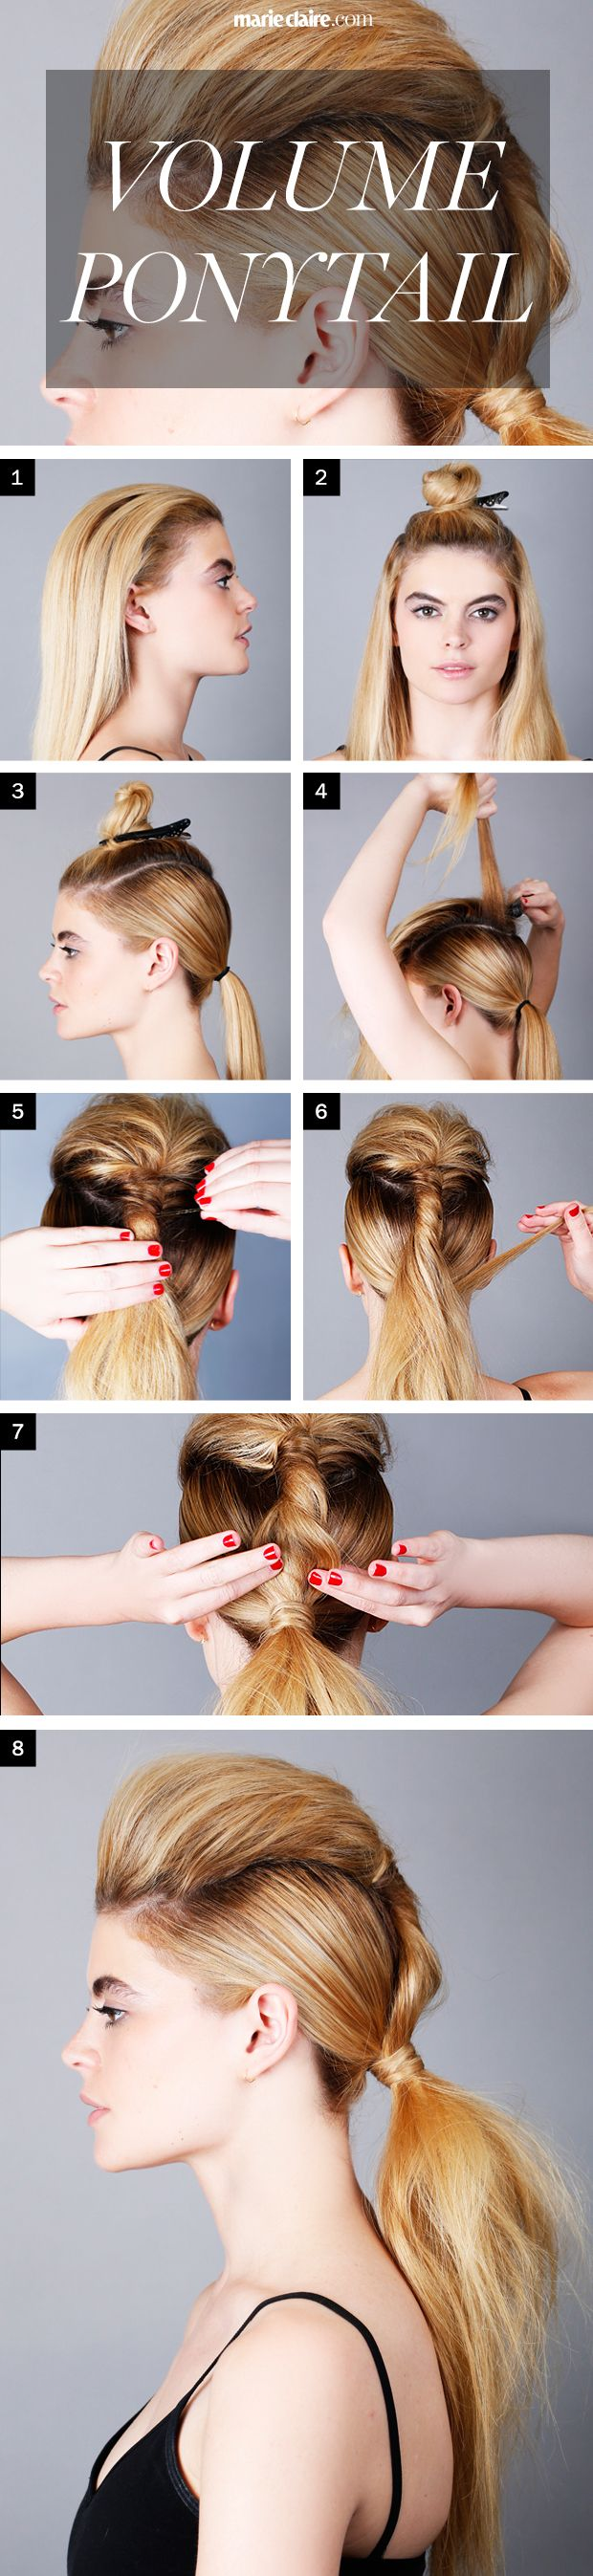 Hair How-To: A Badass Volume Ponytail  - MarieClaire.com